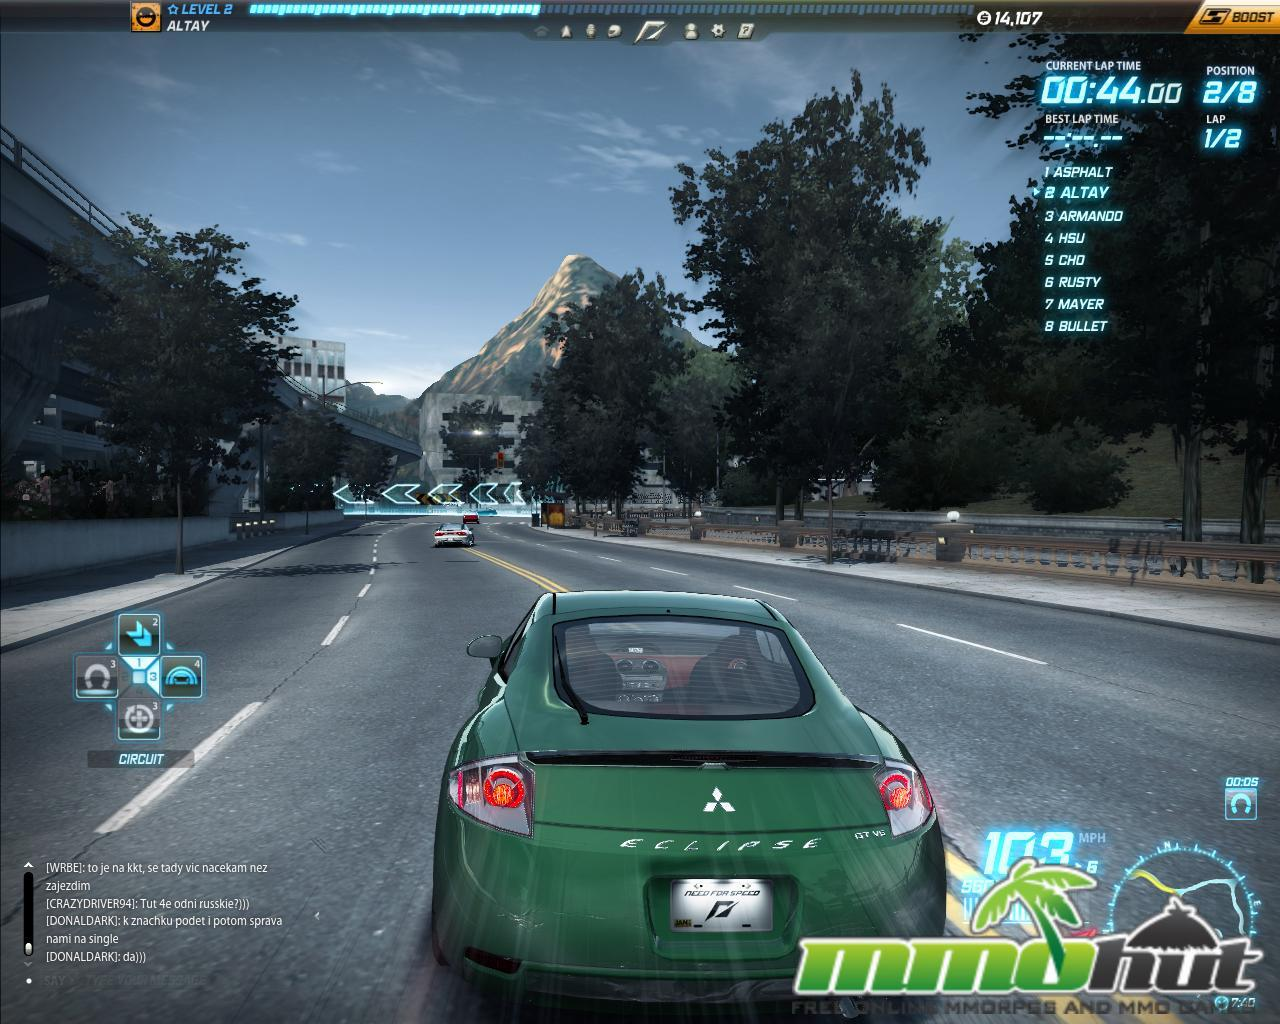 Download Game Racing Jar 320X240 – CHALIGHFOLK74 BLOG